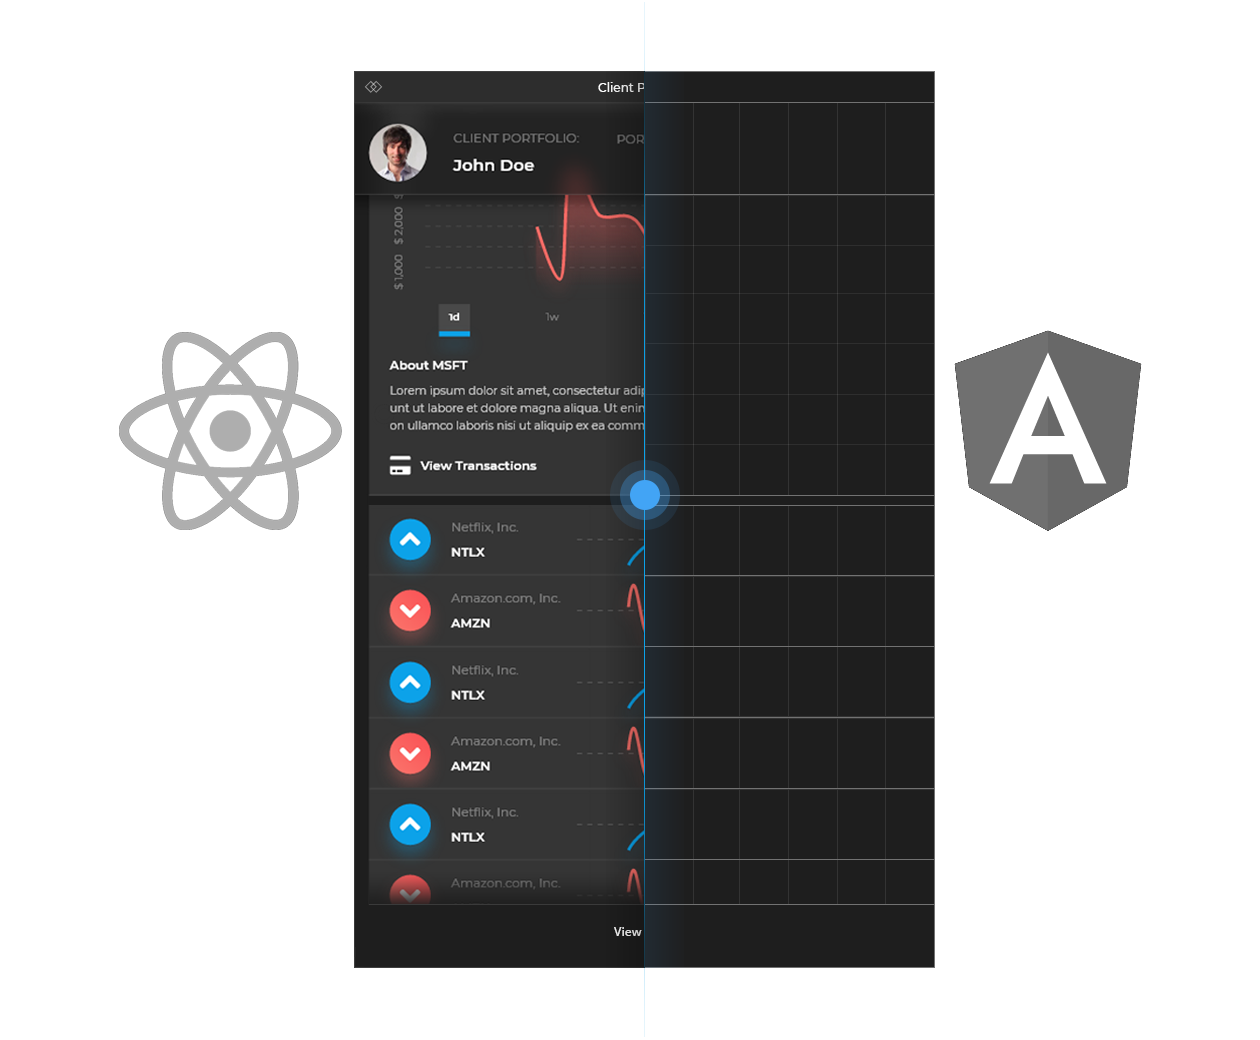 glue42-core-app-wireframe-react-angular